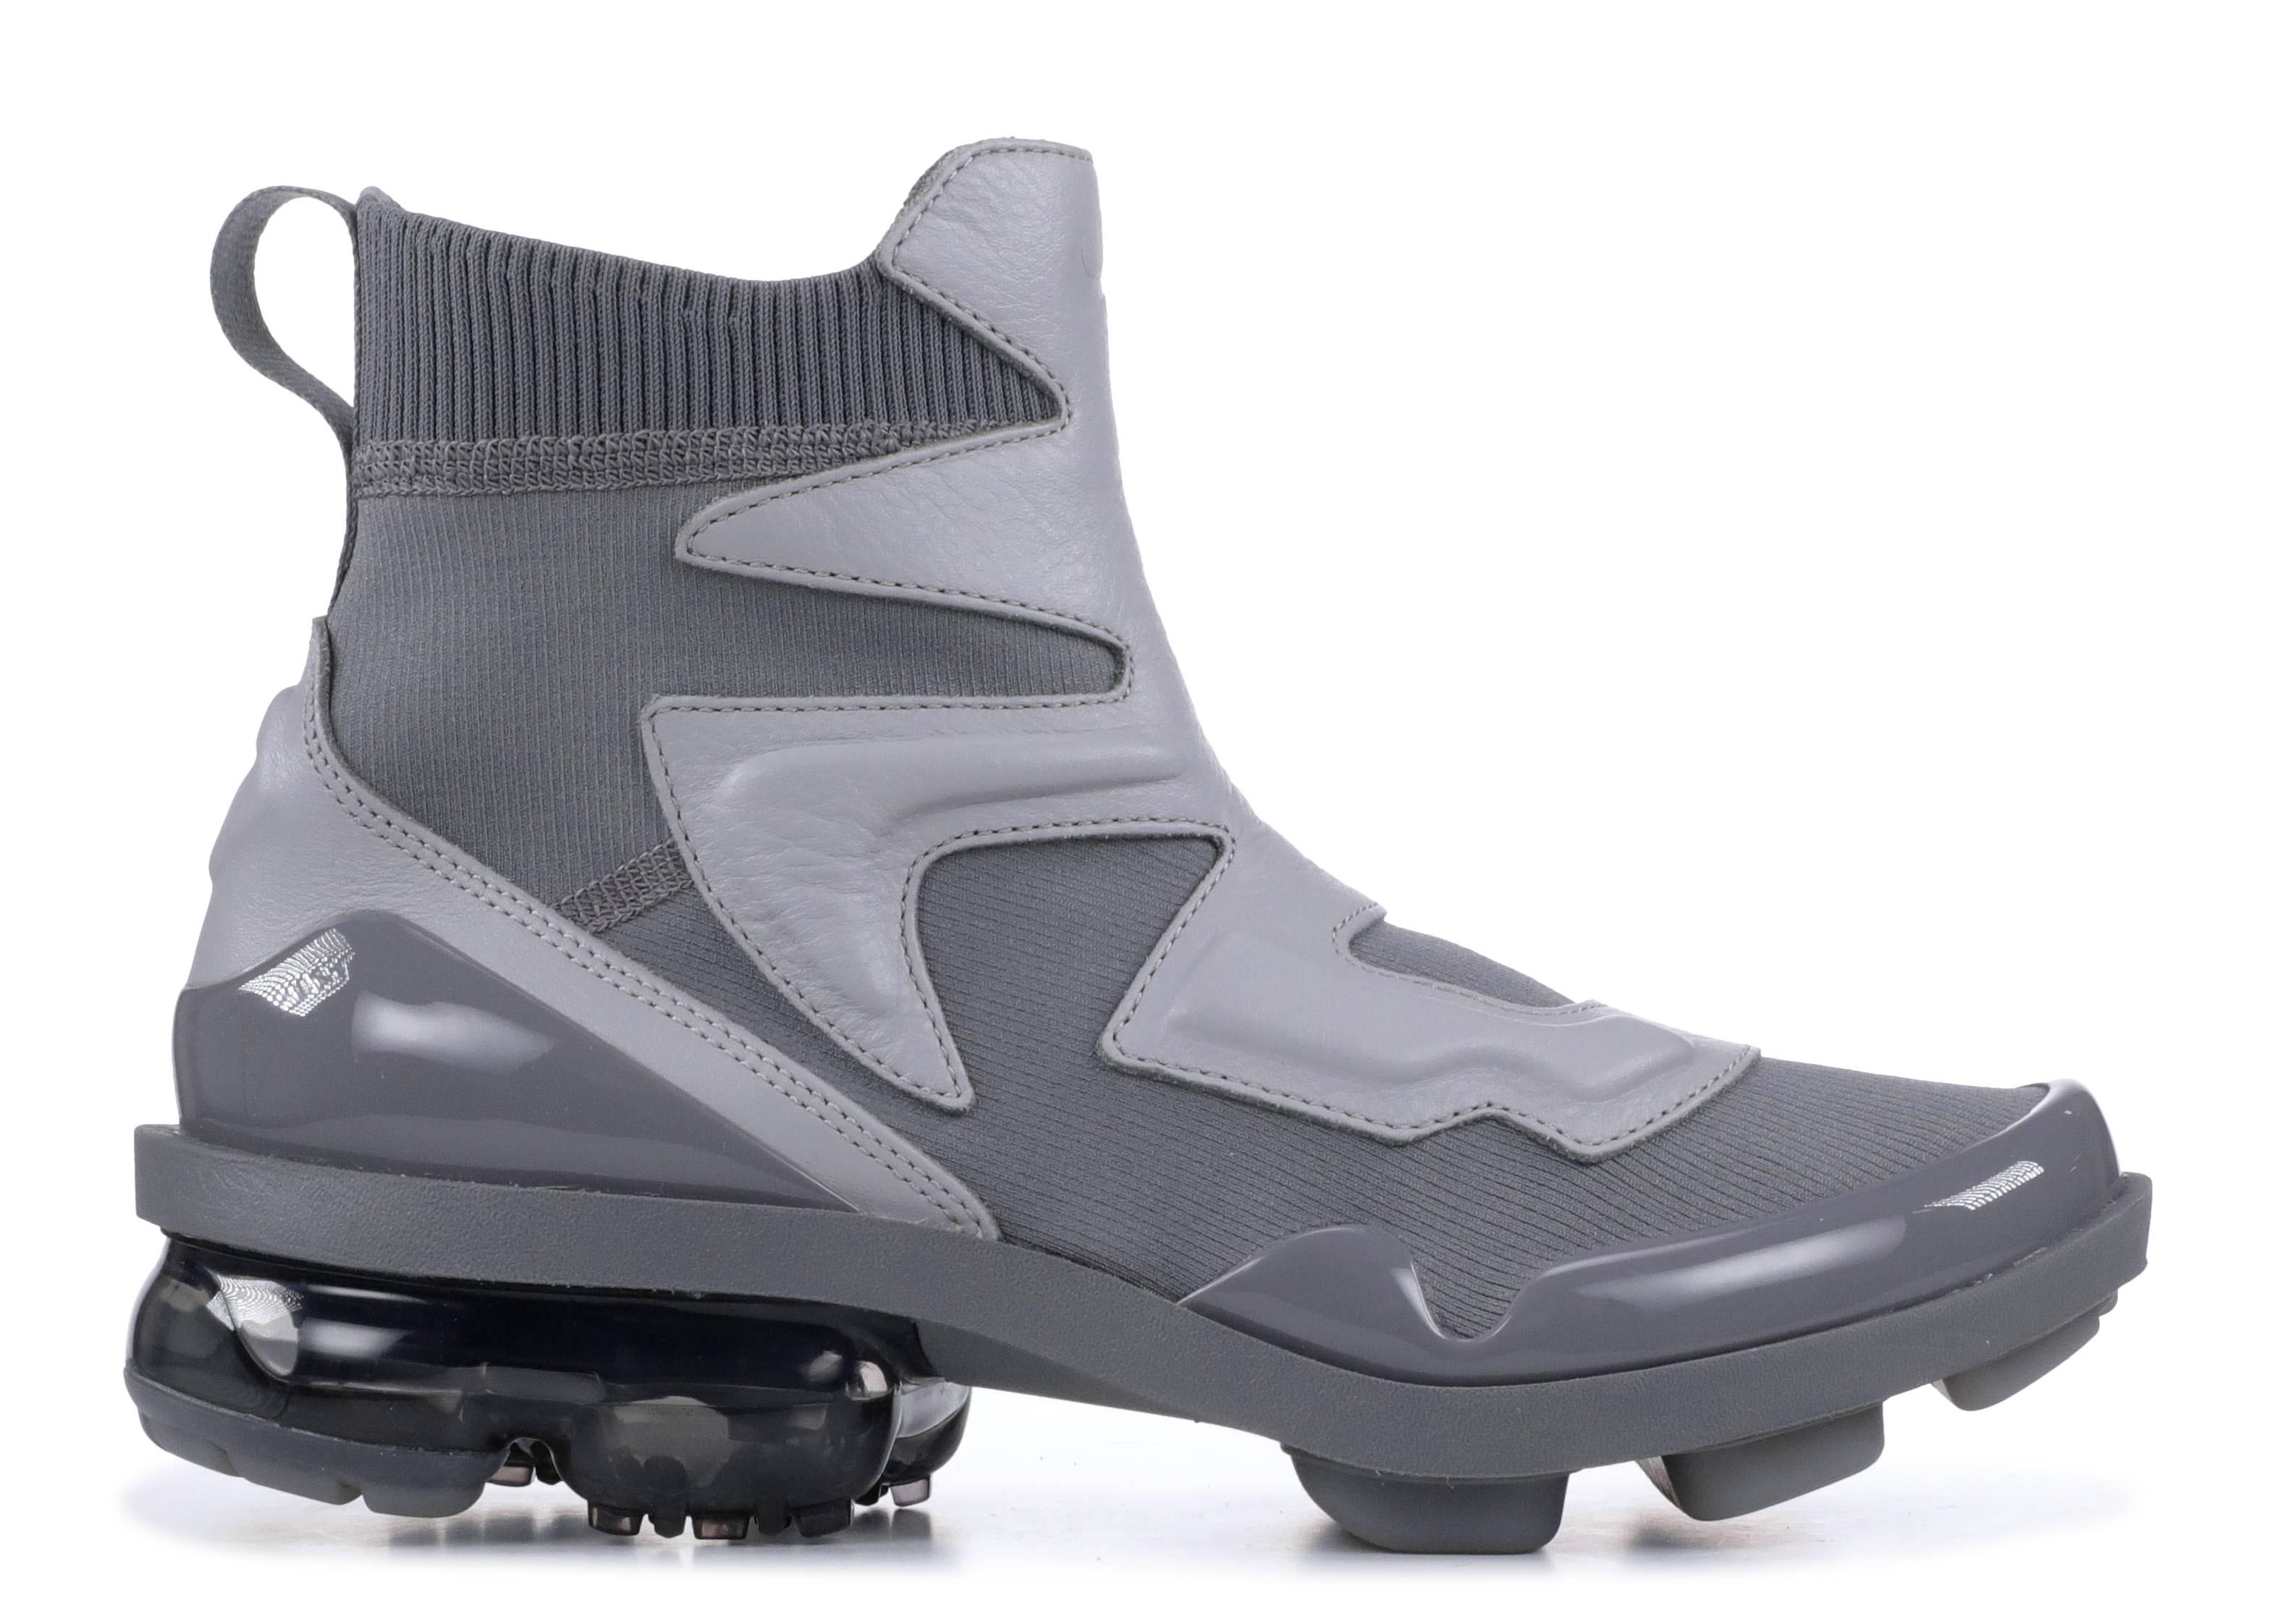 45bf1294b0 W Nike Vapormax Light II